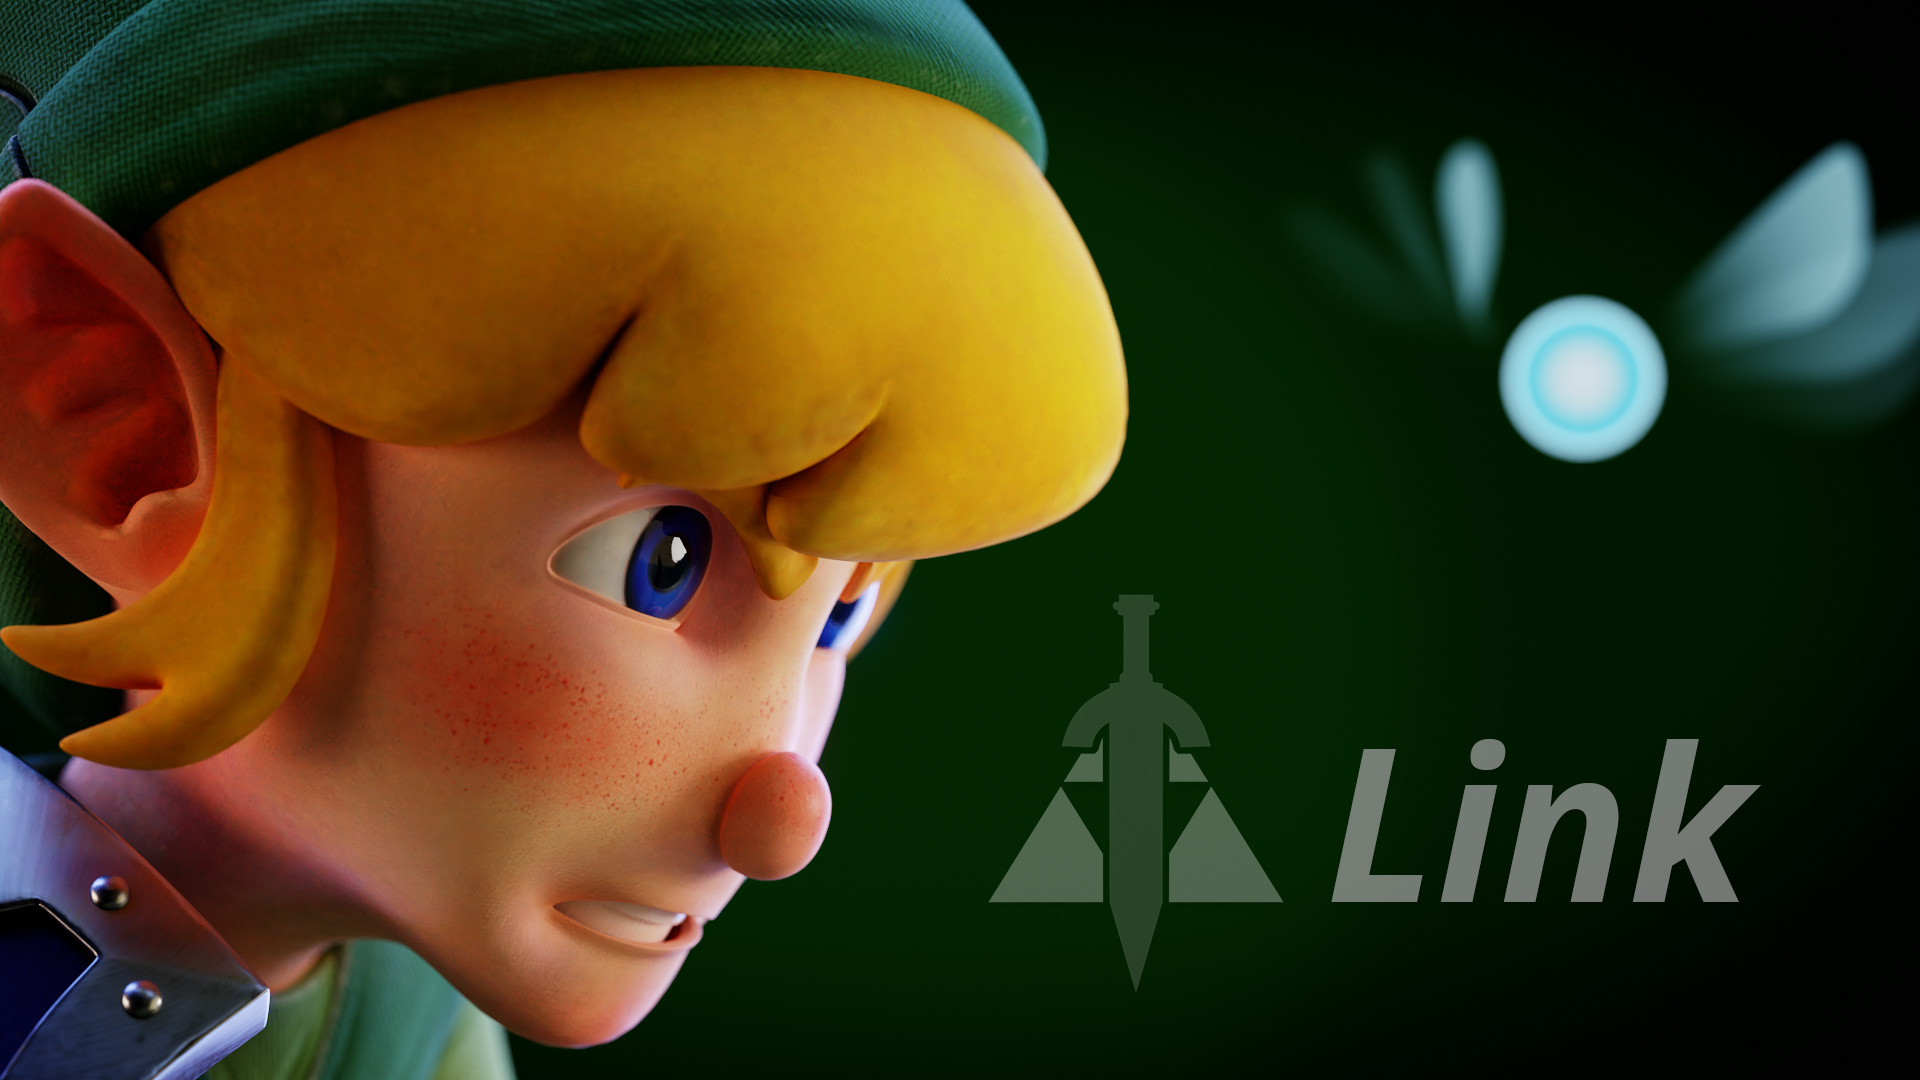 Link The Legend Of Zelda Fanart Finished Projects